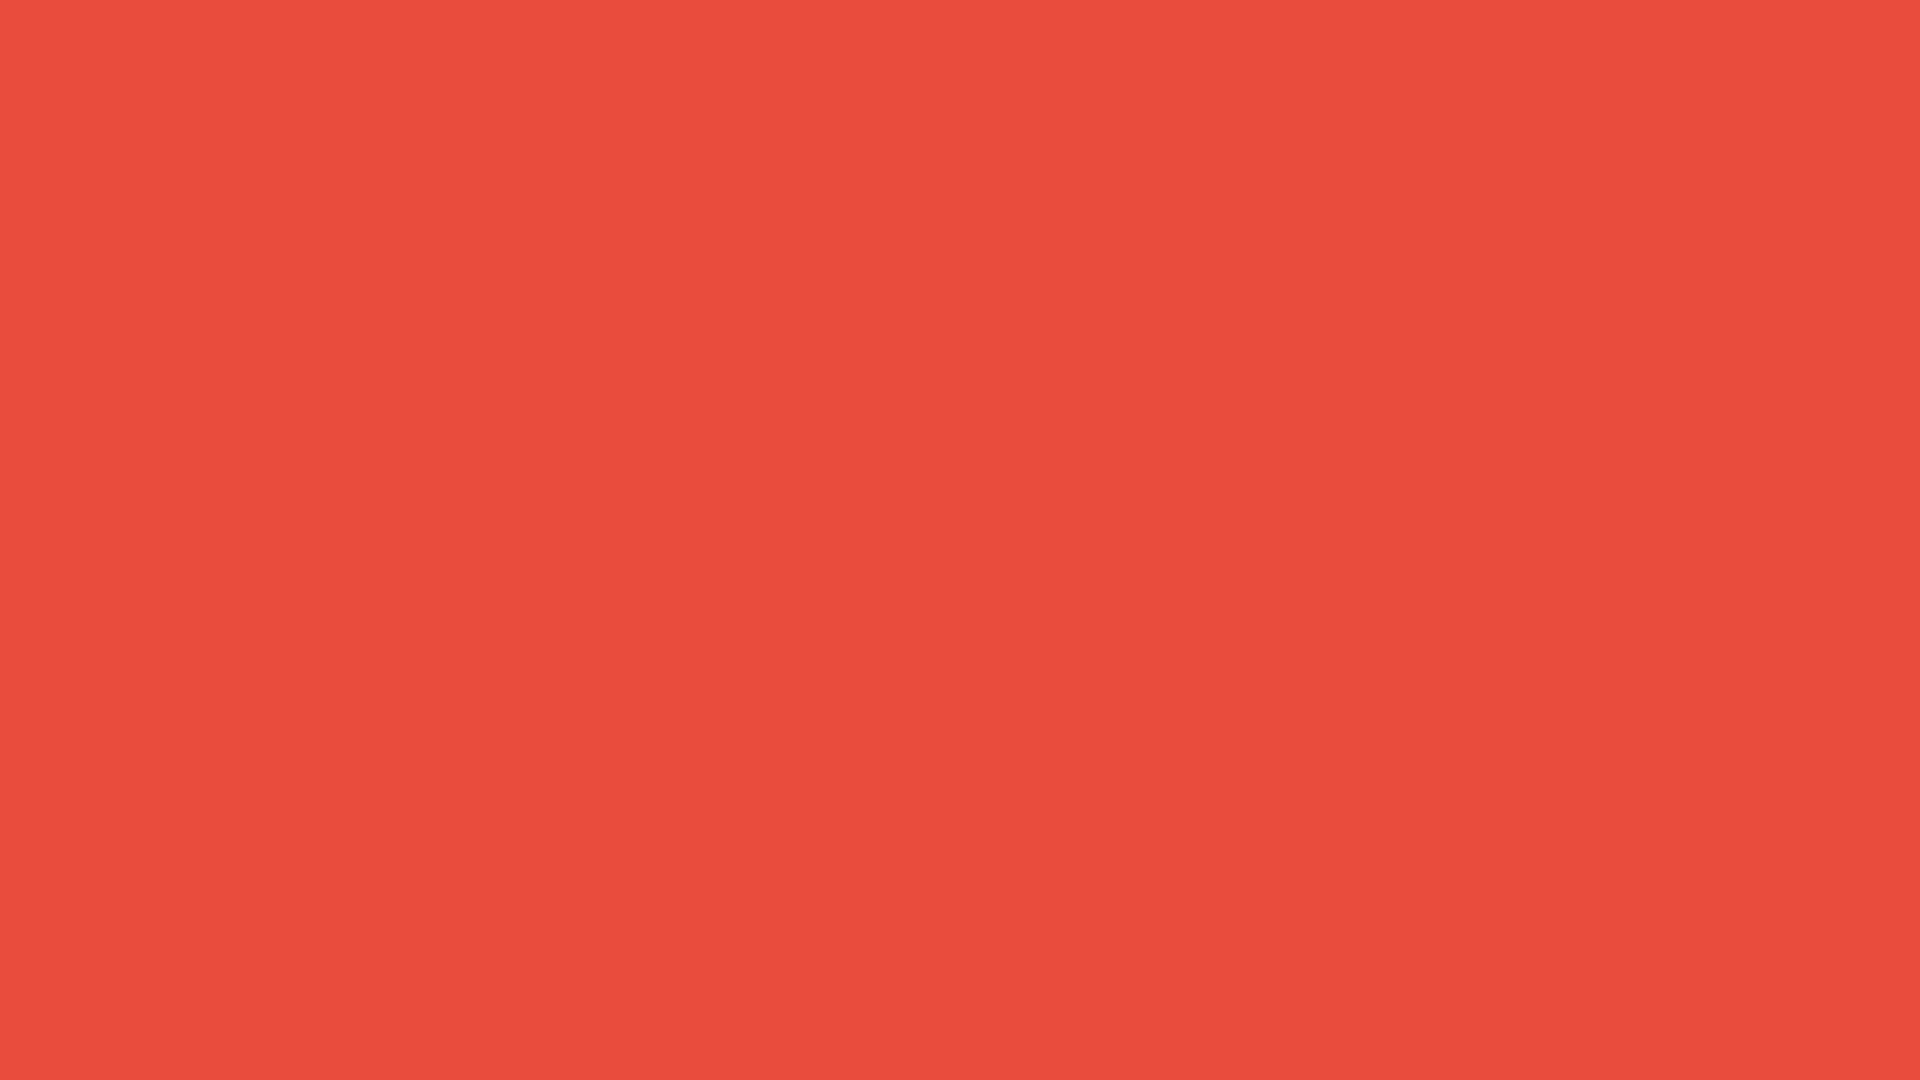 ios-single-flat-color-alizarin